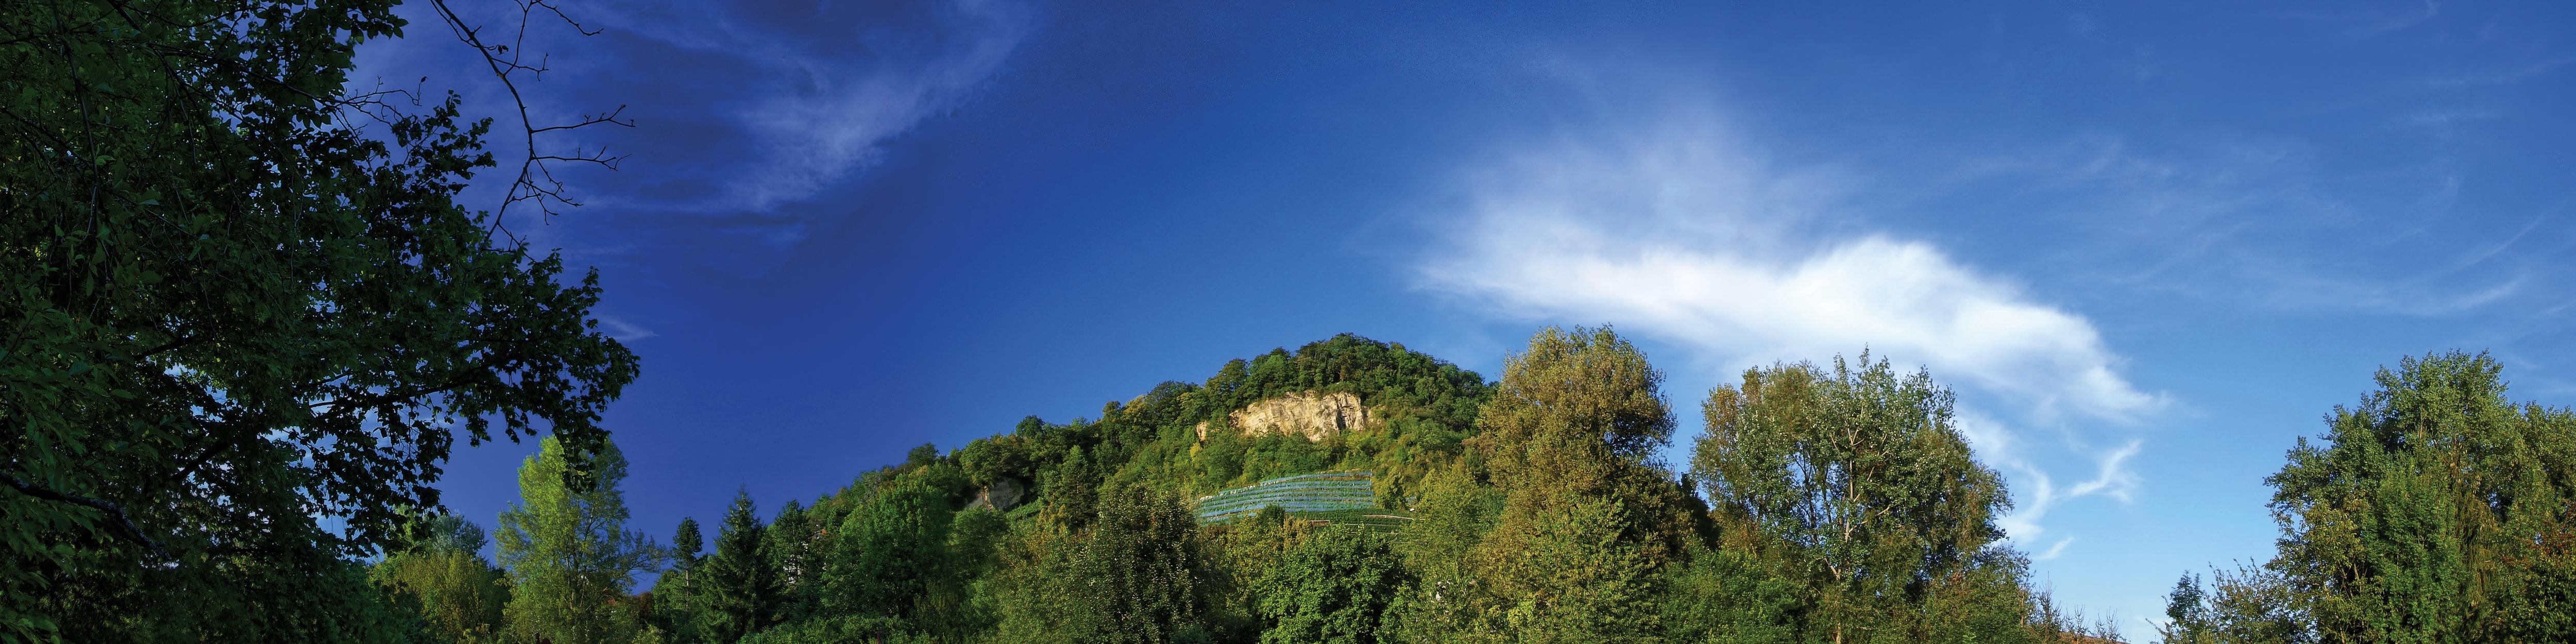 Grenzacher Hornfelsen - a landmark